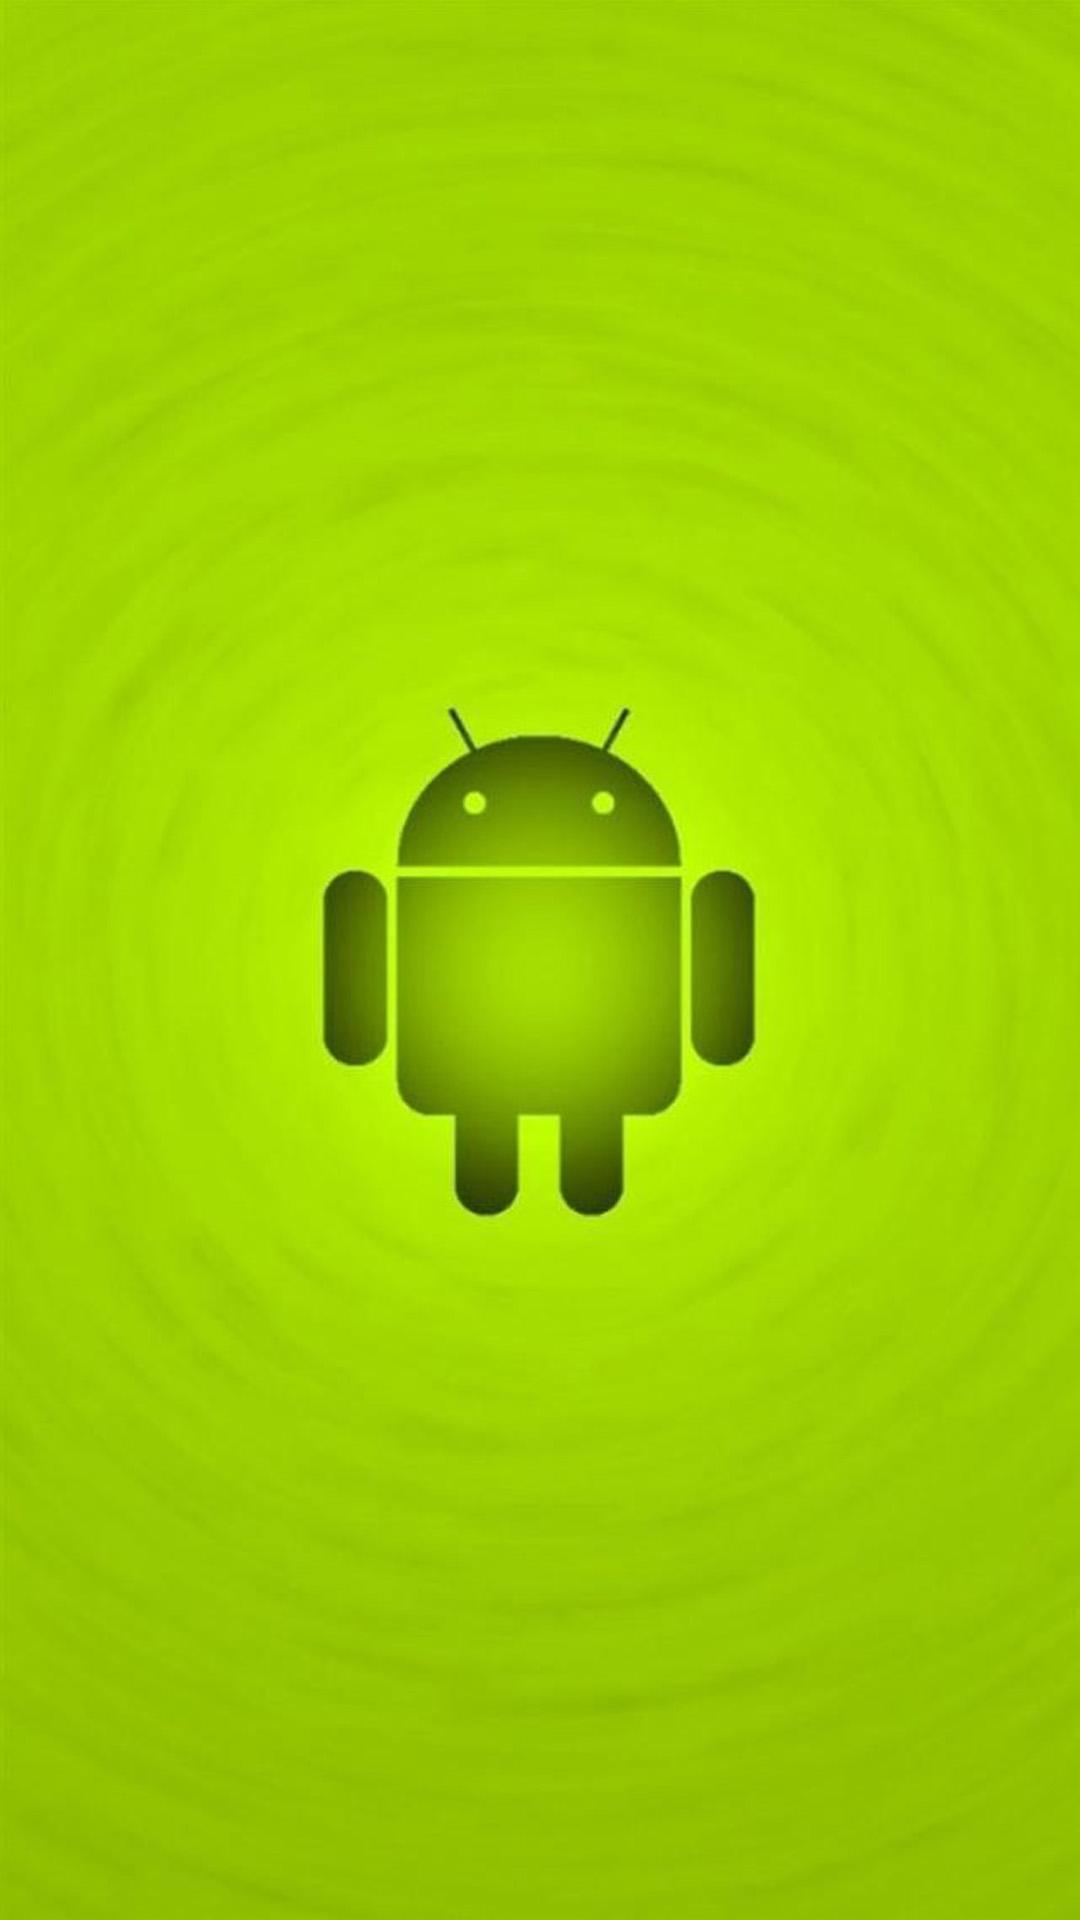 75+ Android Logo Wallpaper on WallpaperSafari